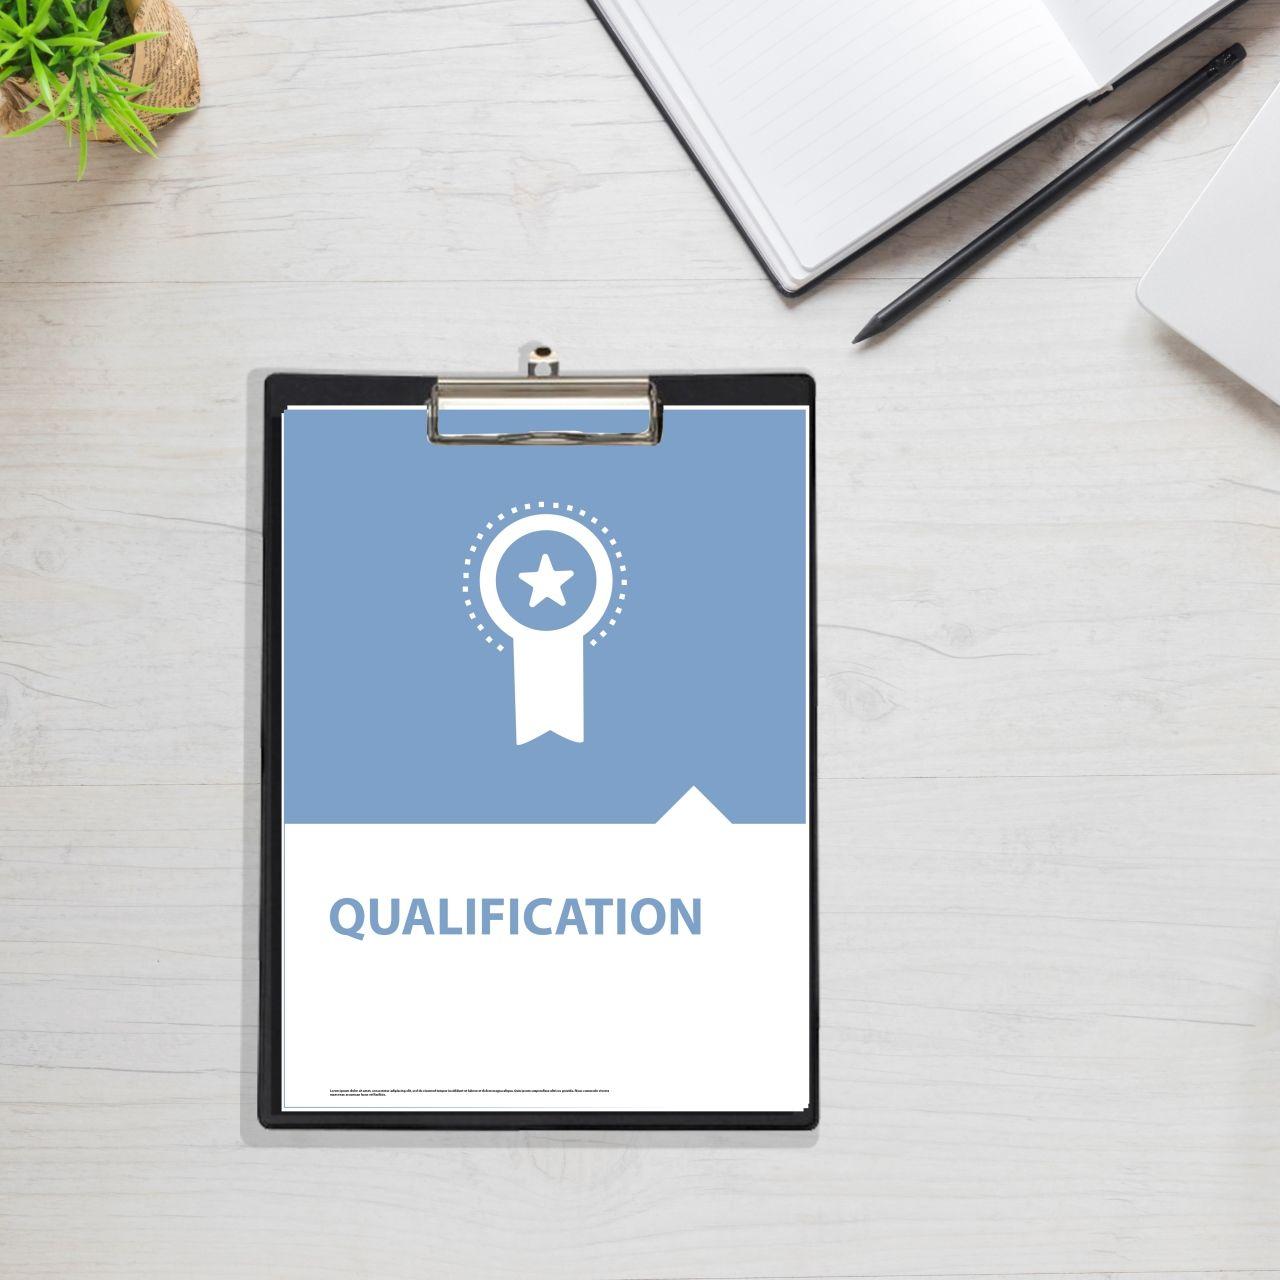 Image Qualification